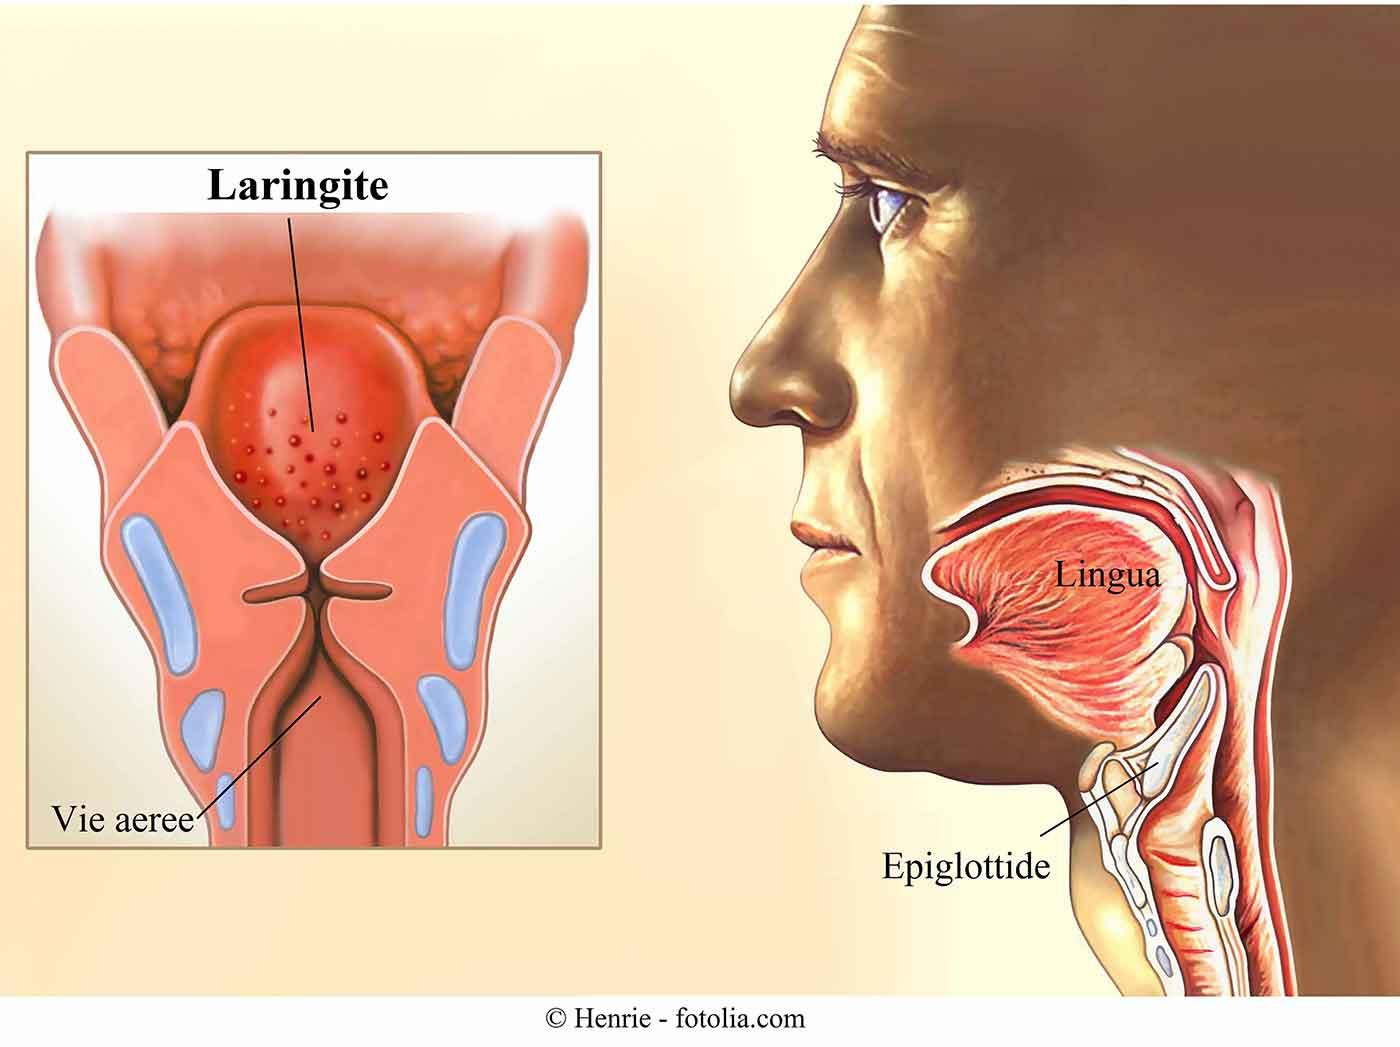 laringite-infiammazione